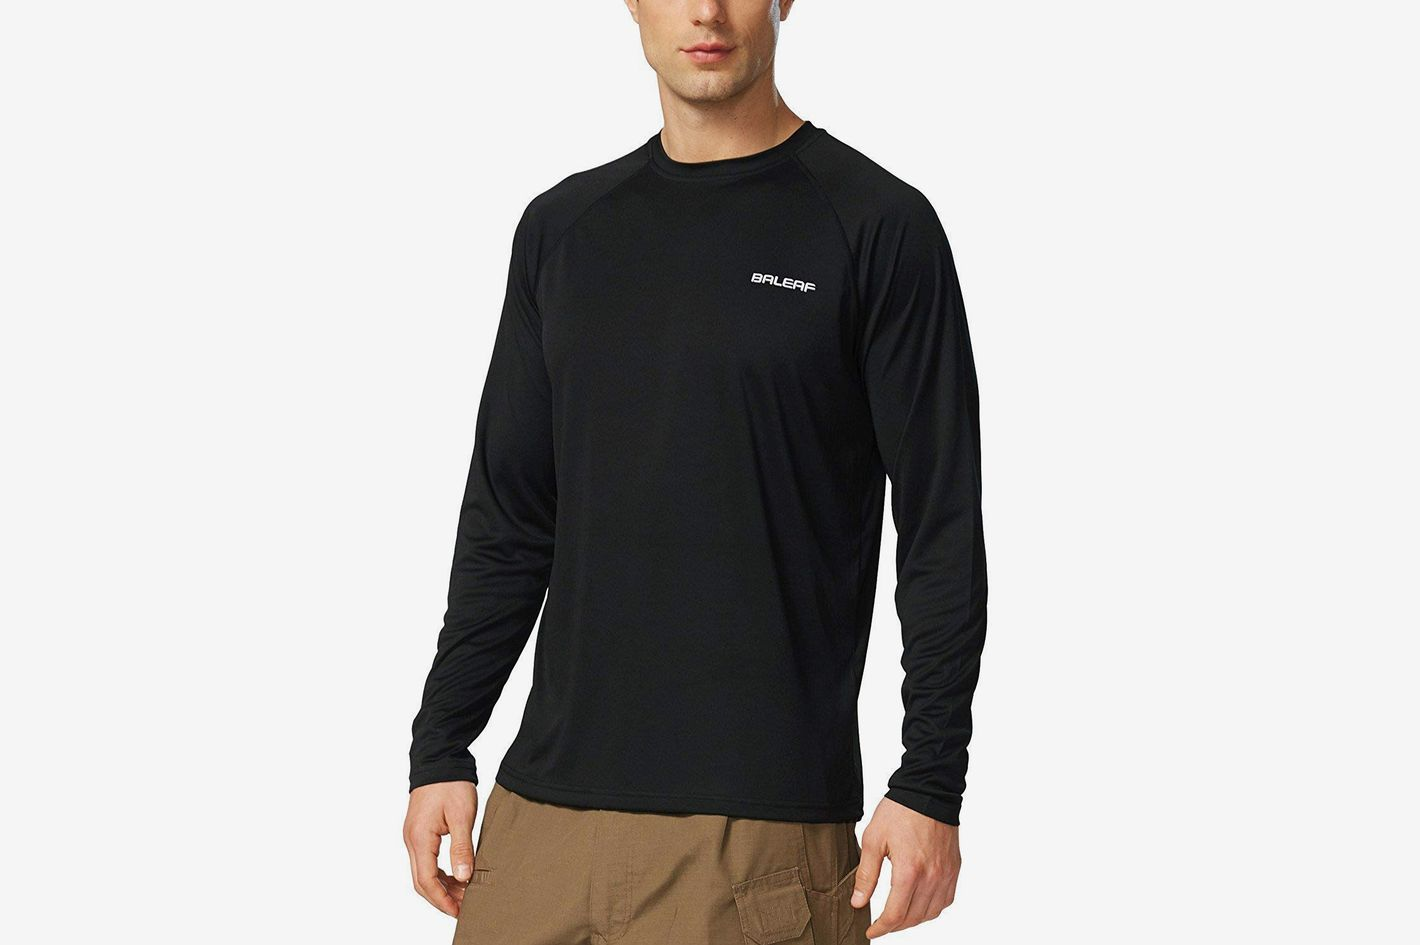 ab7b65676da Baleaf Men s UPF 50+ UV Sun Protection Outdoor Running Performance T-Shirt